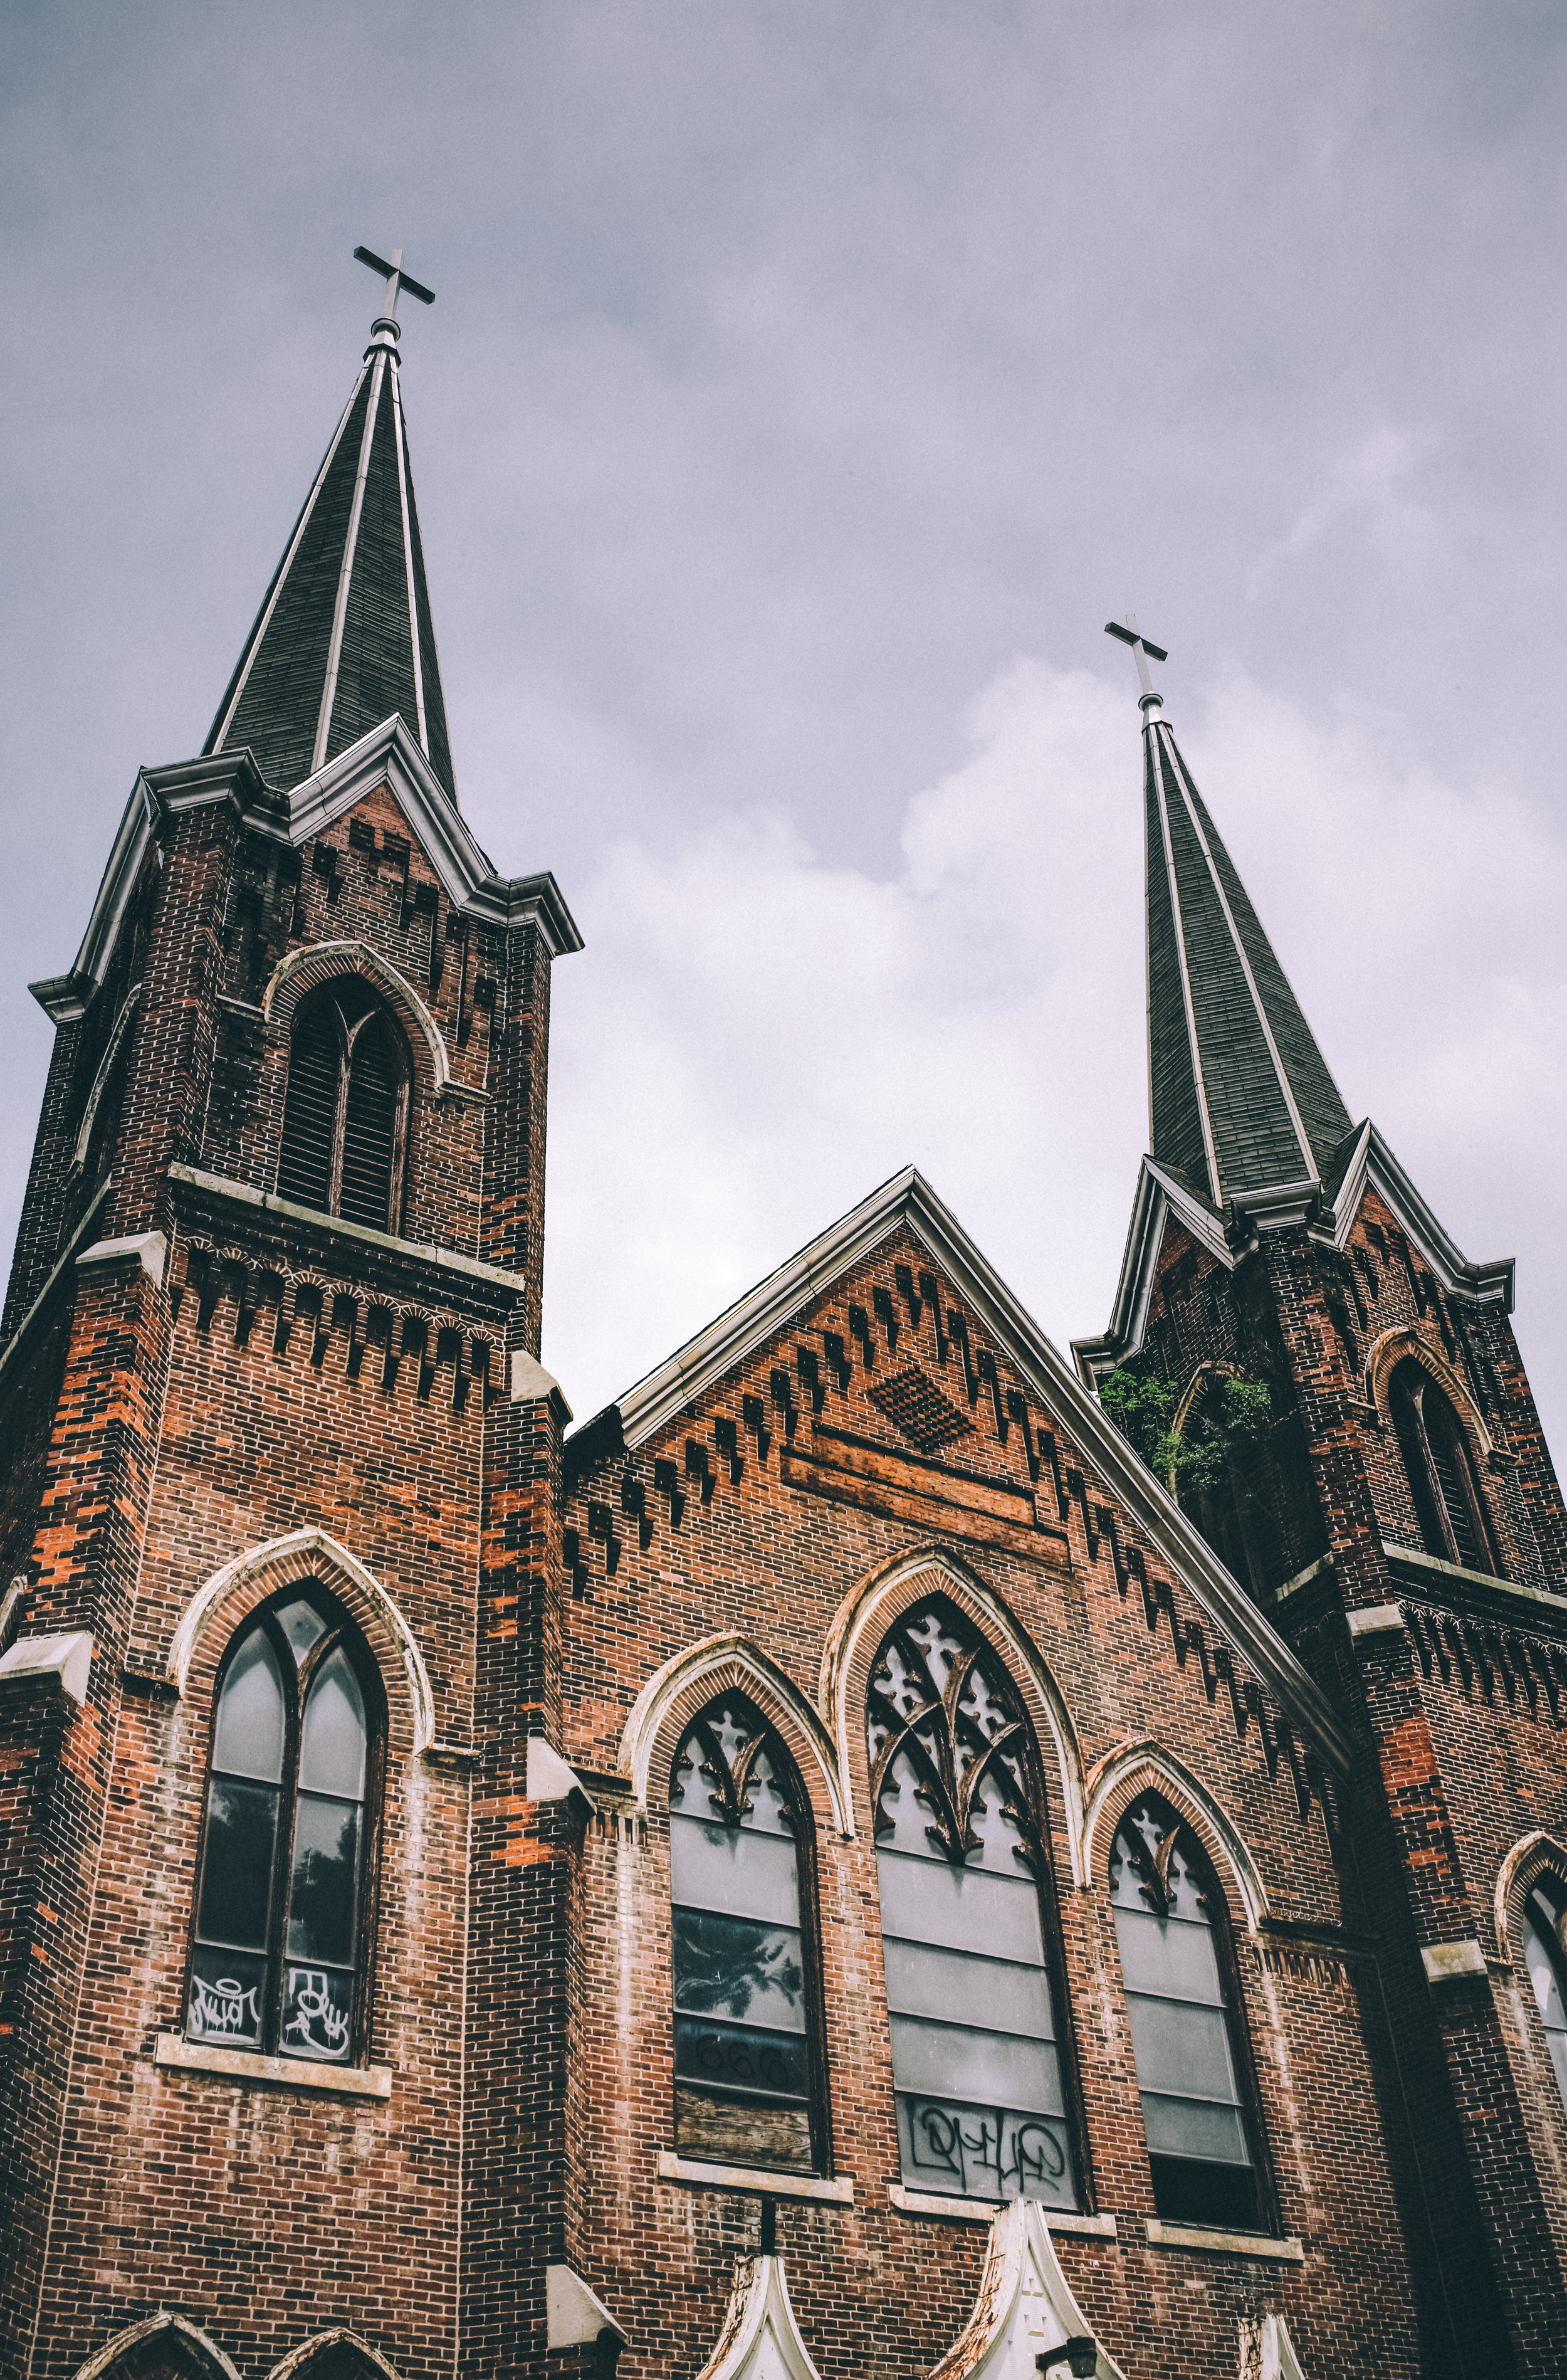 kw-hungarian-church-img3.jpg